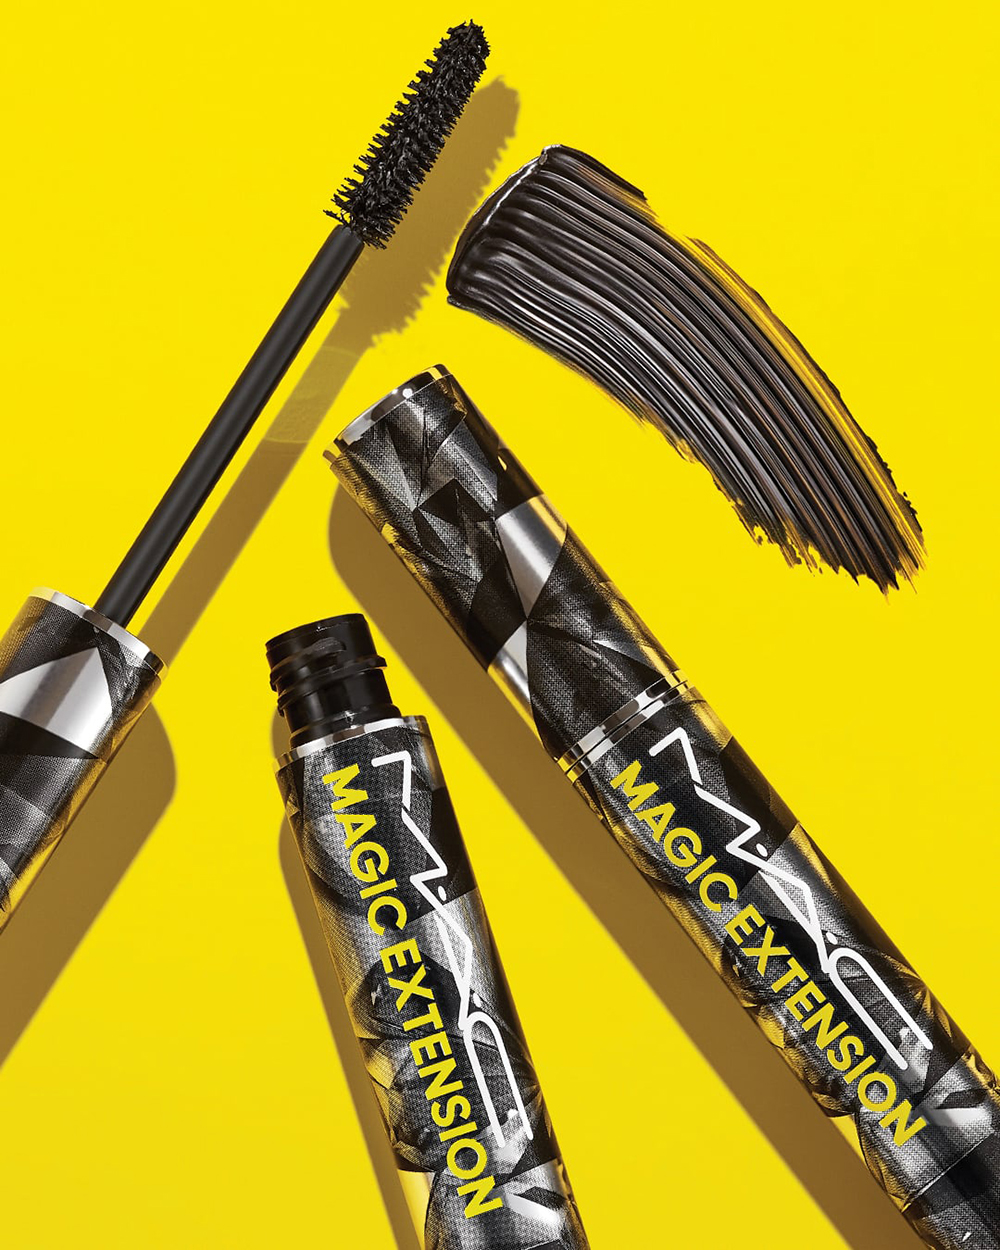 June 2021 Makeup Releases I New MAC Mascara #beautyblog #makeupaddict